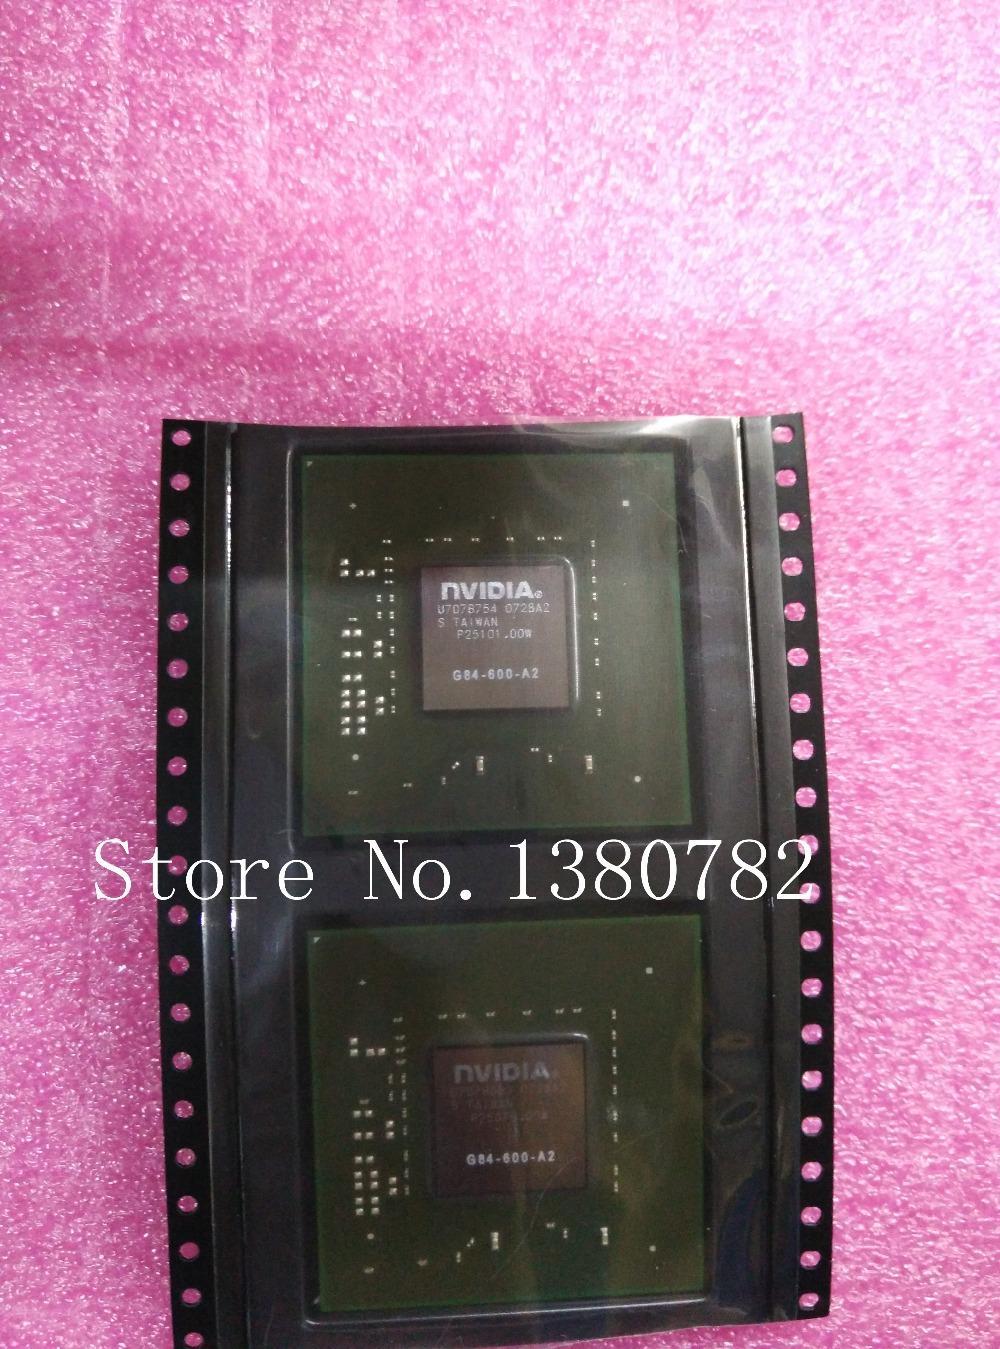 Иль trasporto либеро originale 2 пз/лото g84600a2 nvidia g84-600-a2 g84 600 a2 bga nuovo originale ic в stcok!